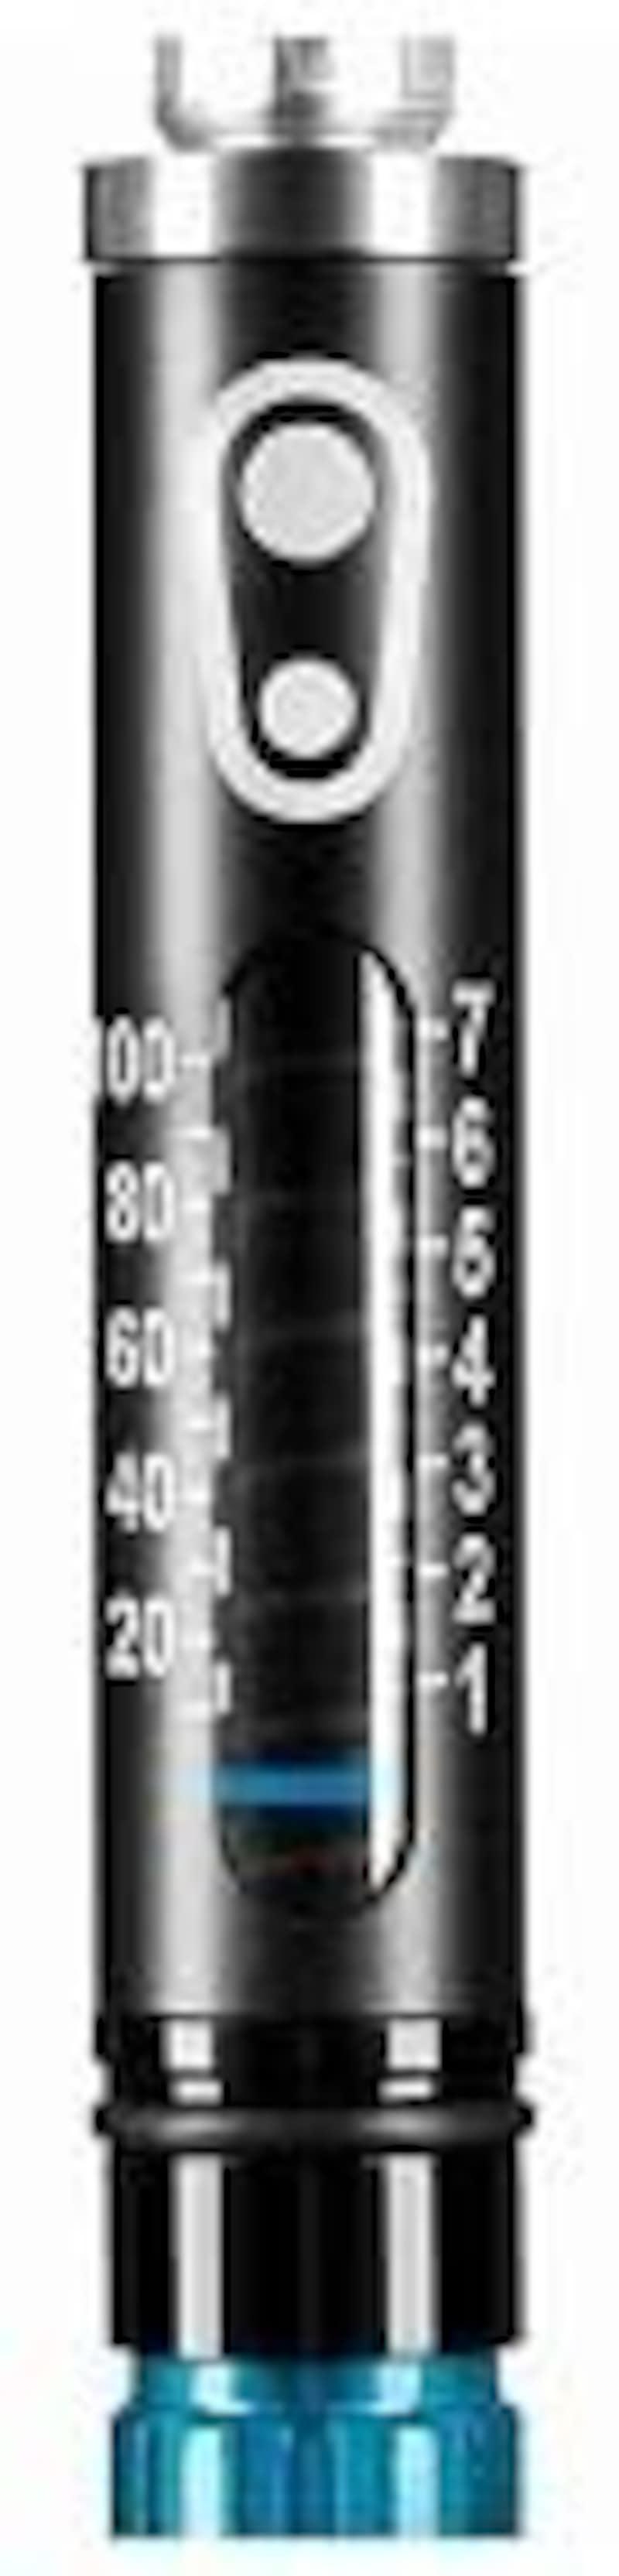 crankbrothers(クランクブラザーズ),自転車 高圧携帯空気入れ ミニポンプ 仏式 米式,046565